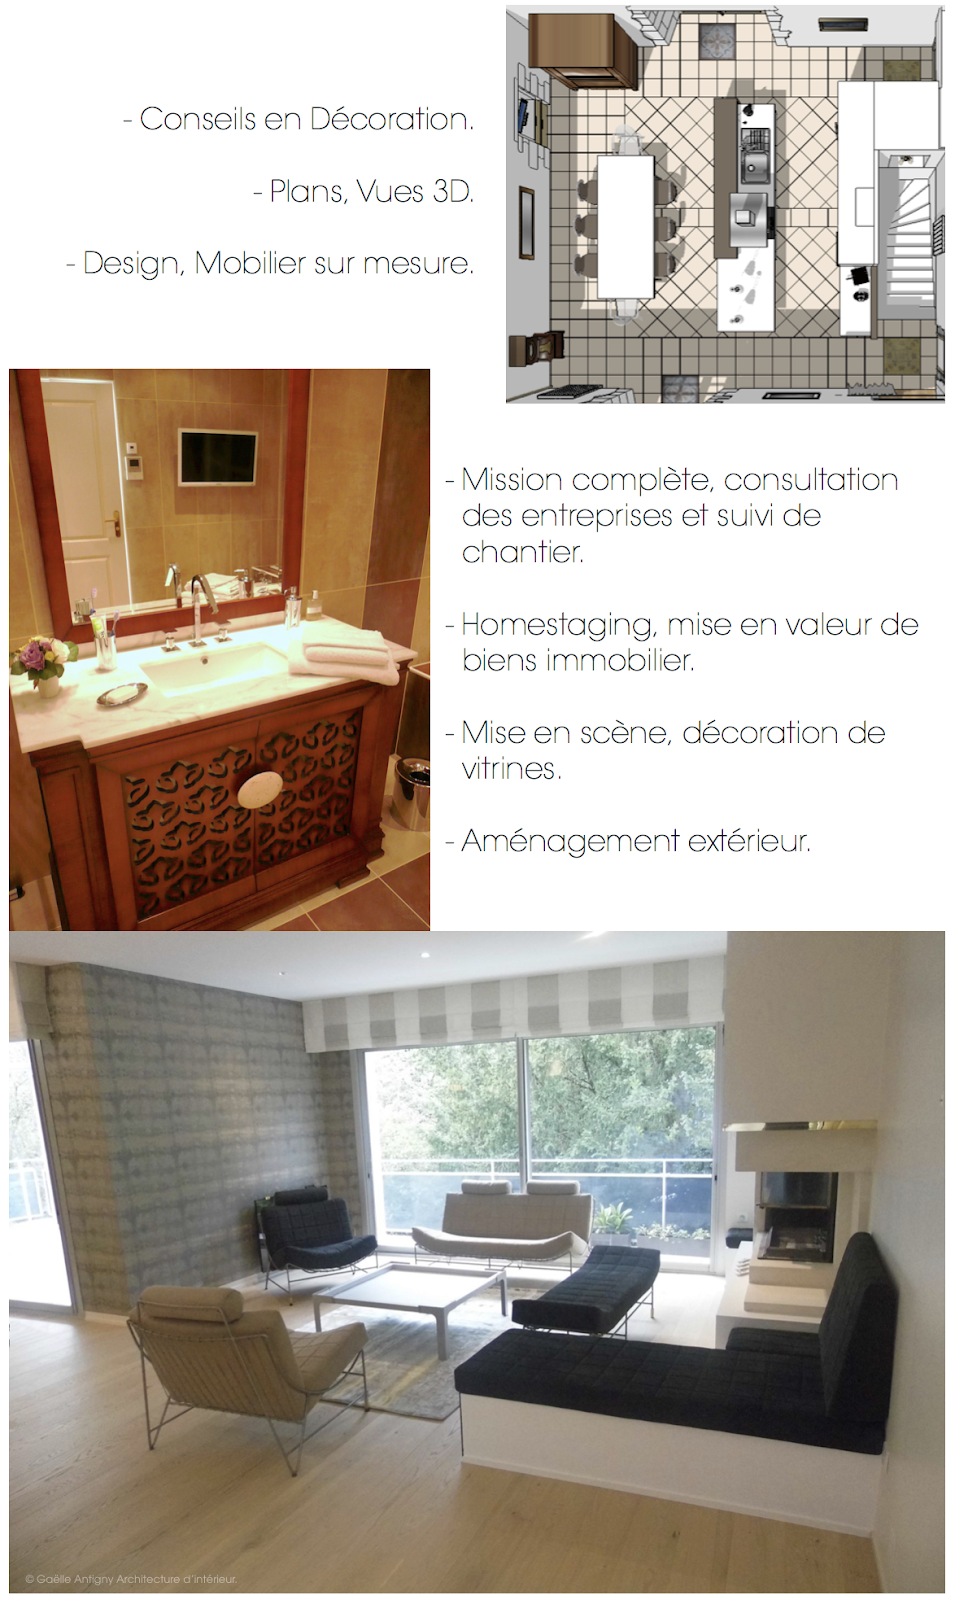 Gaelle_Antigny_Architecture_d_interieur_Services_Poitiers